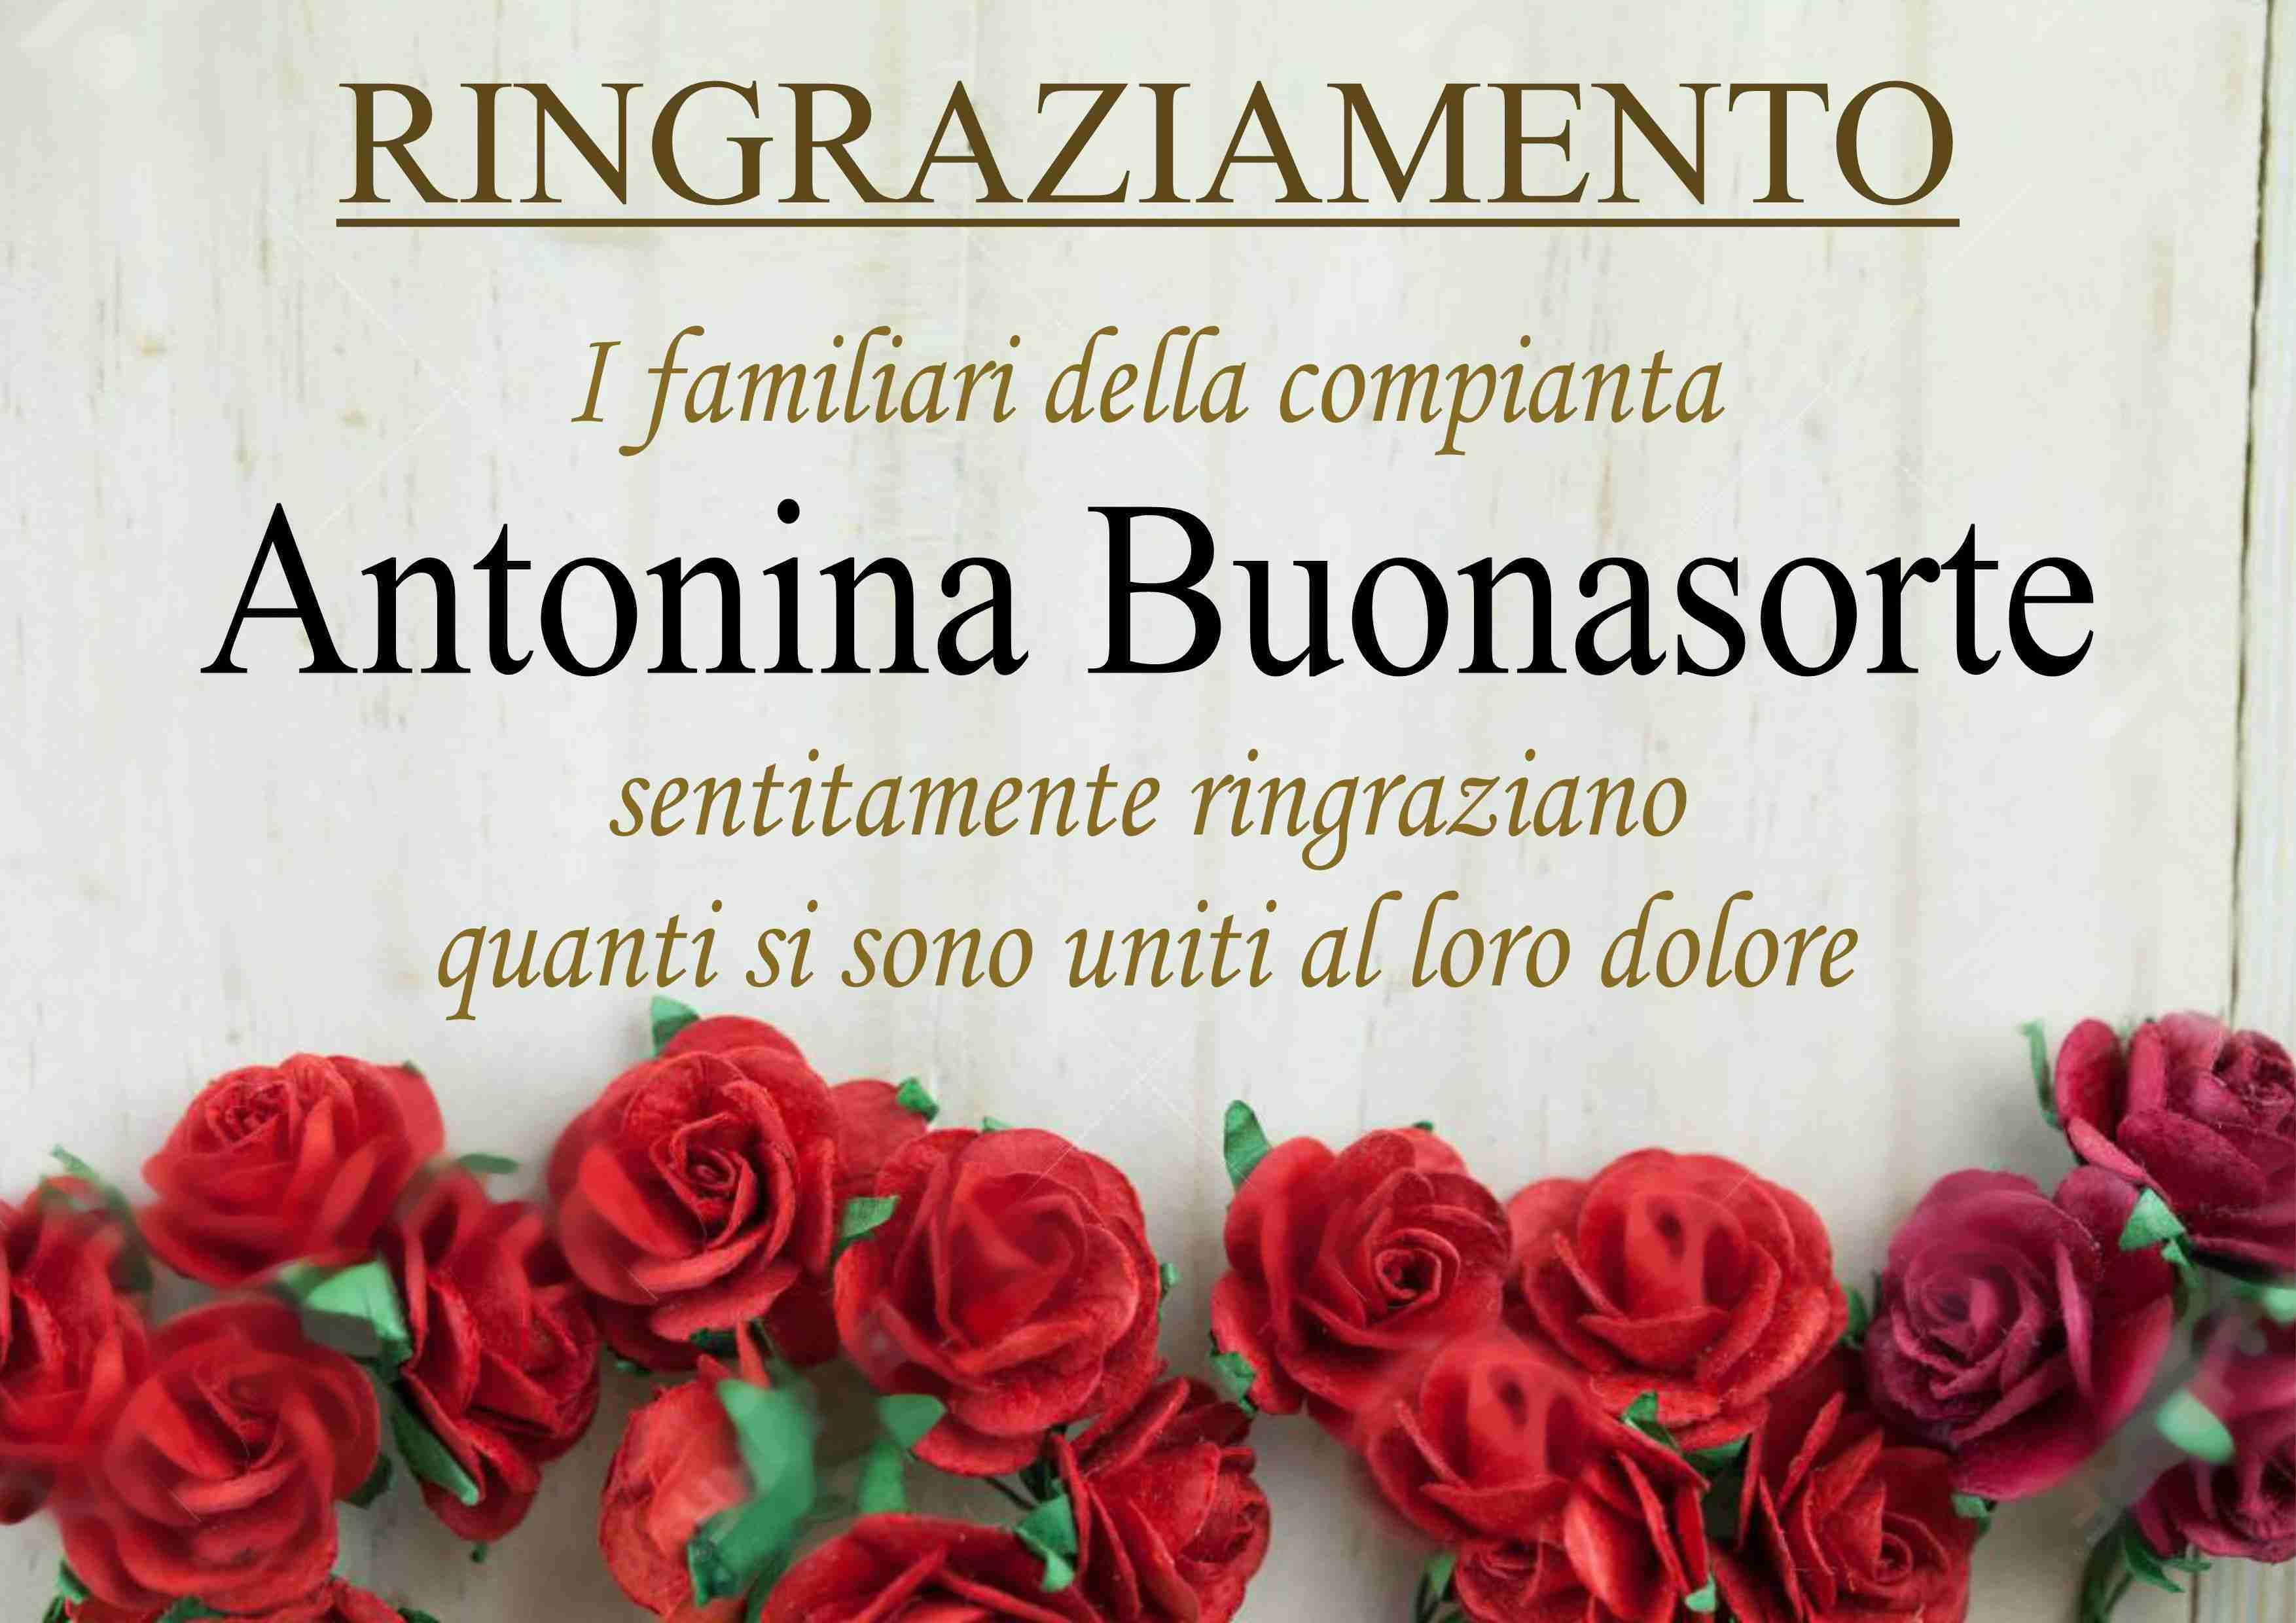 Antonina Buonasorte